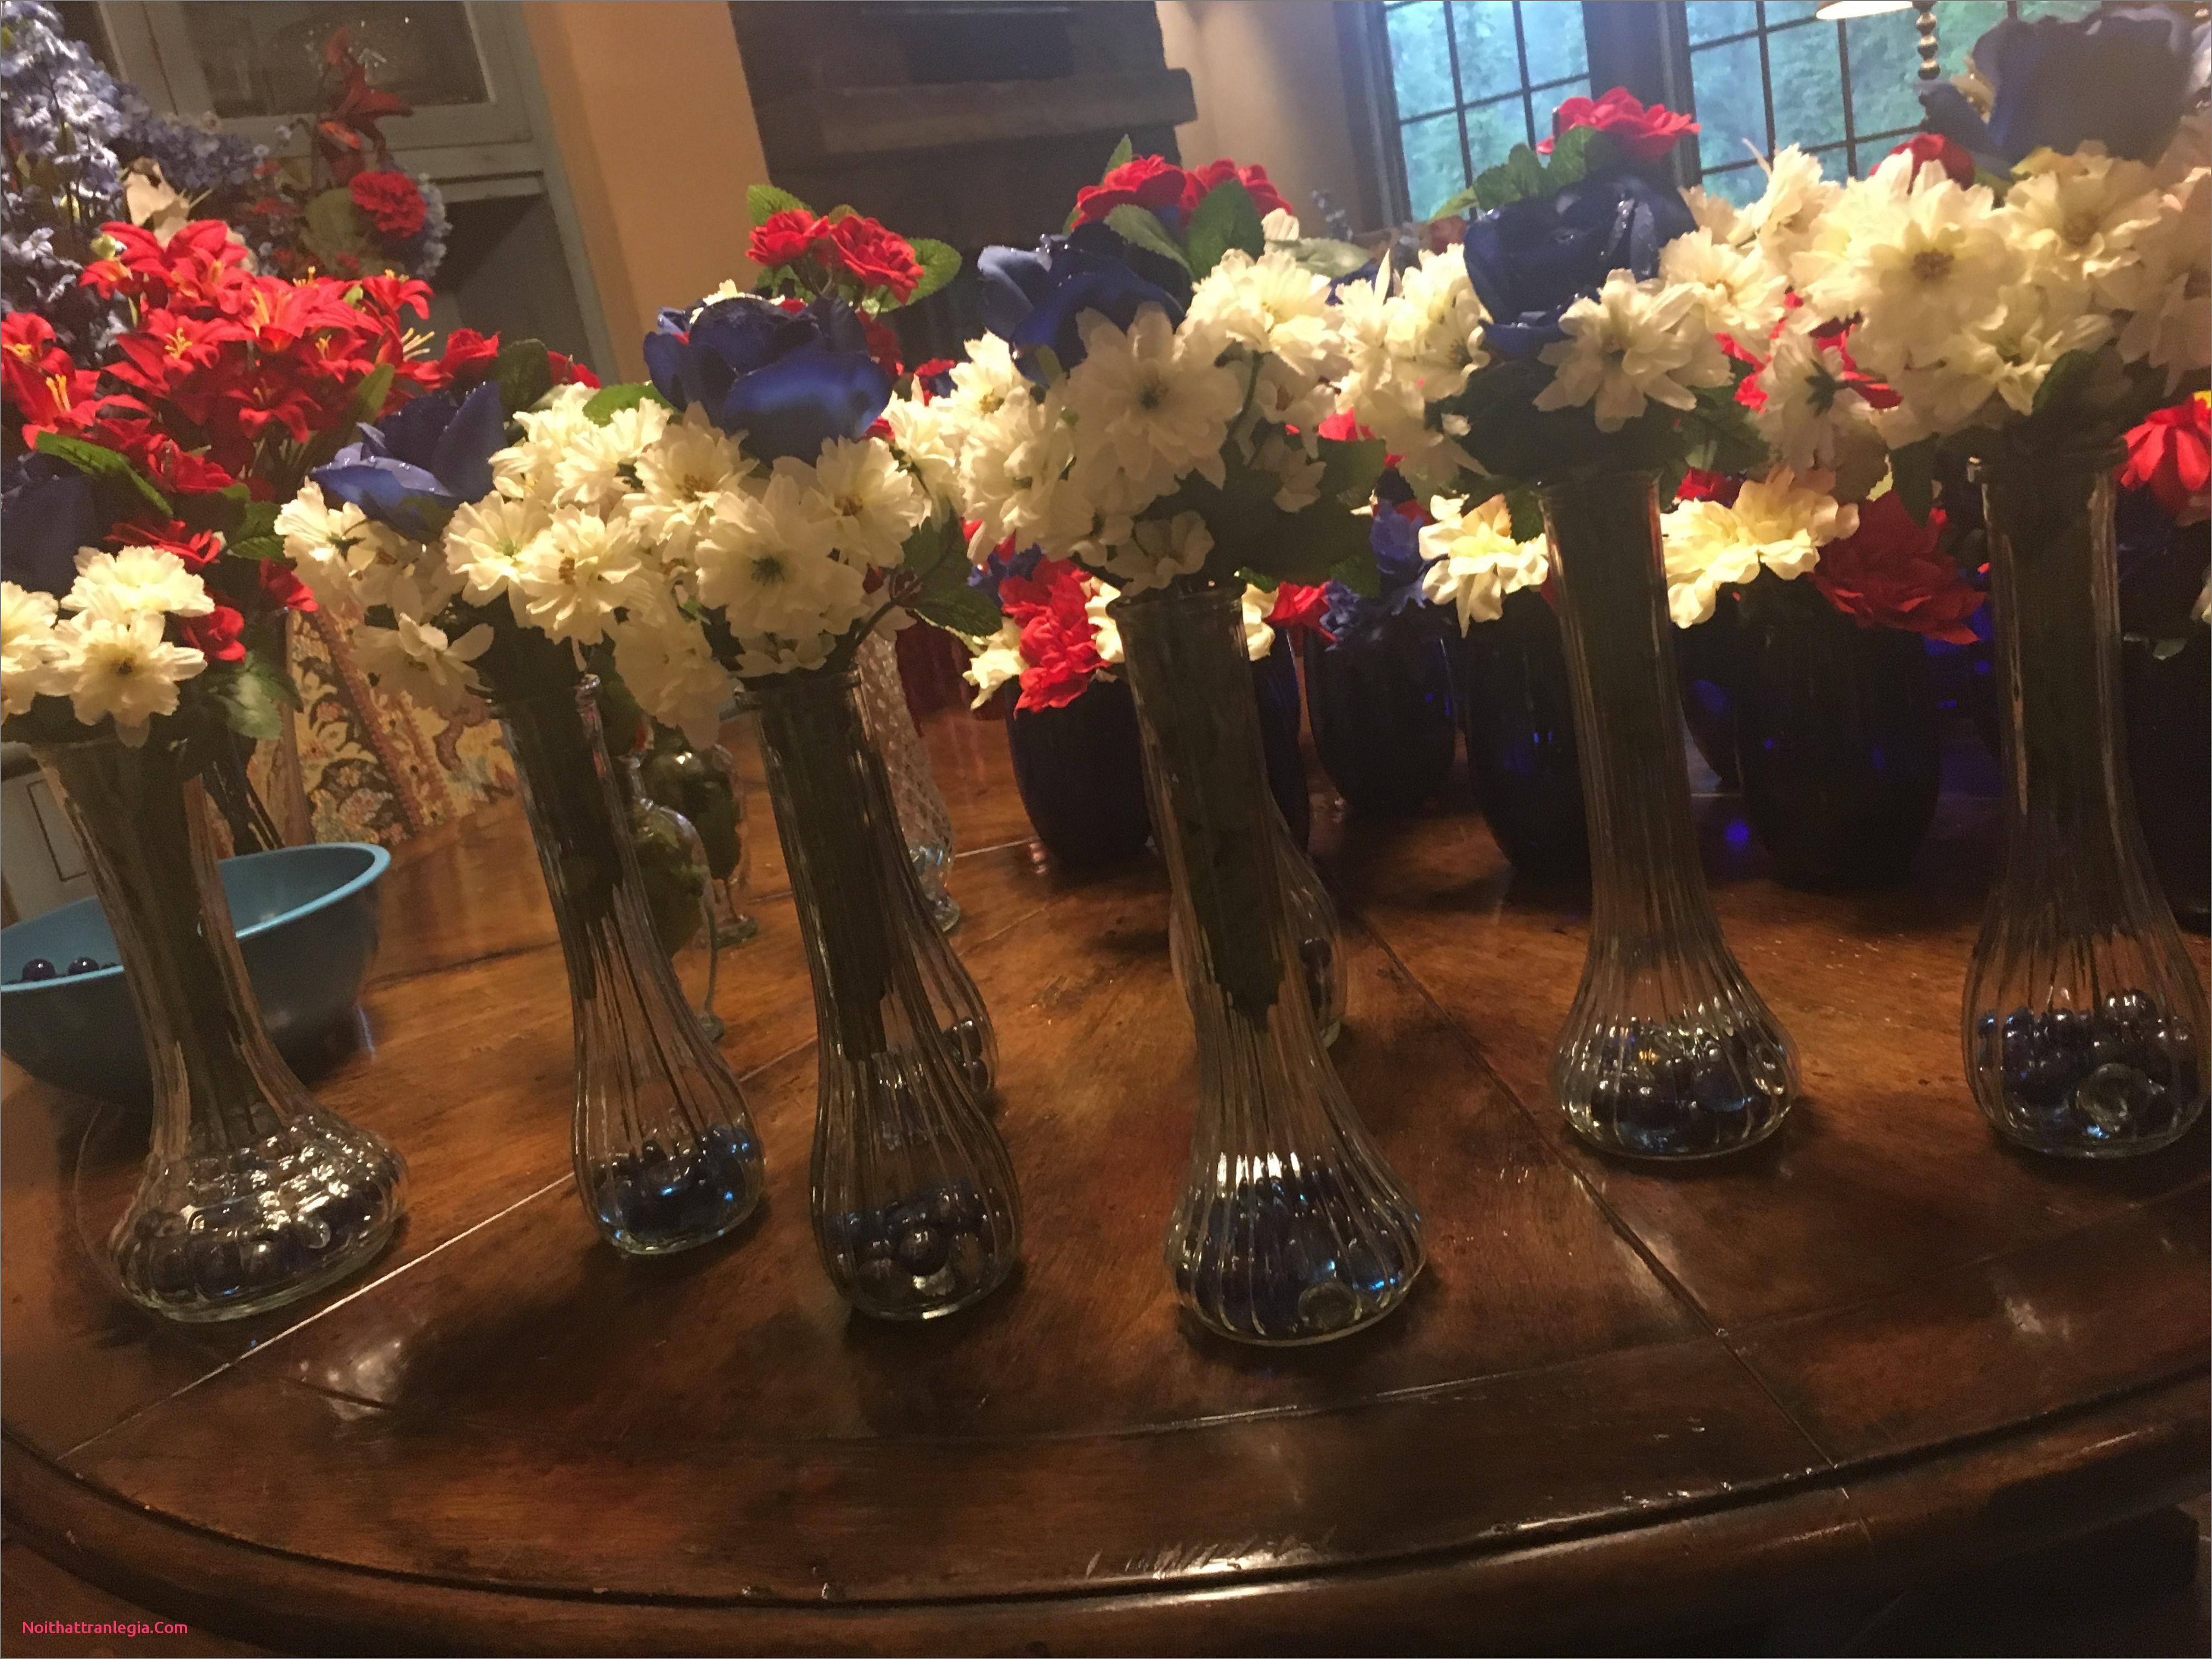 metal floral vases of 20 wedding vases noithattranlegia vases design inside decoration line luxury dollar tree wedding decorations awesome h vases dollar vase i 0d